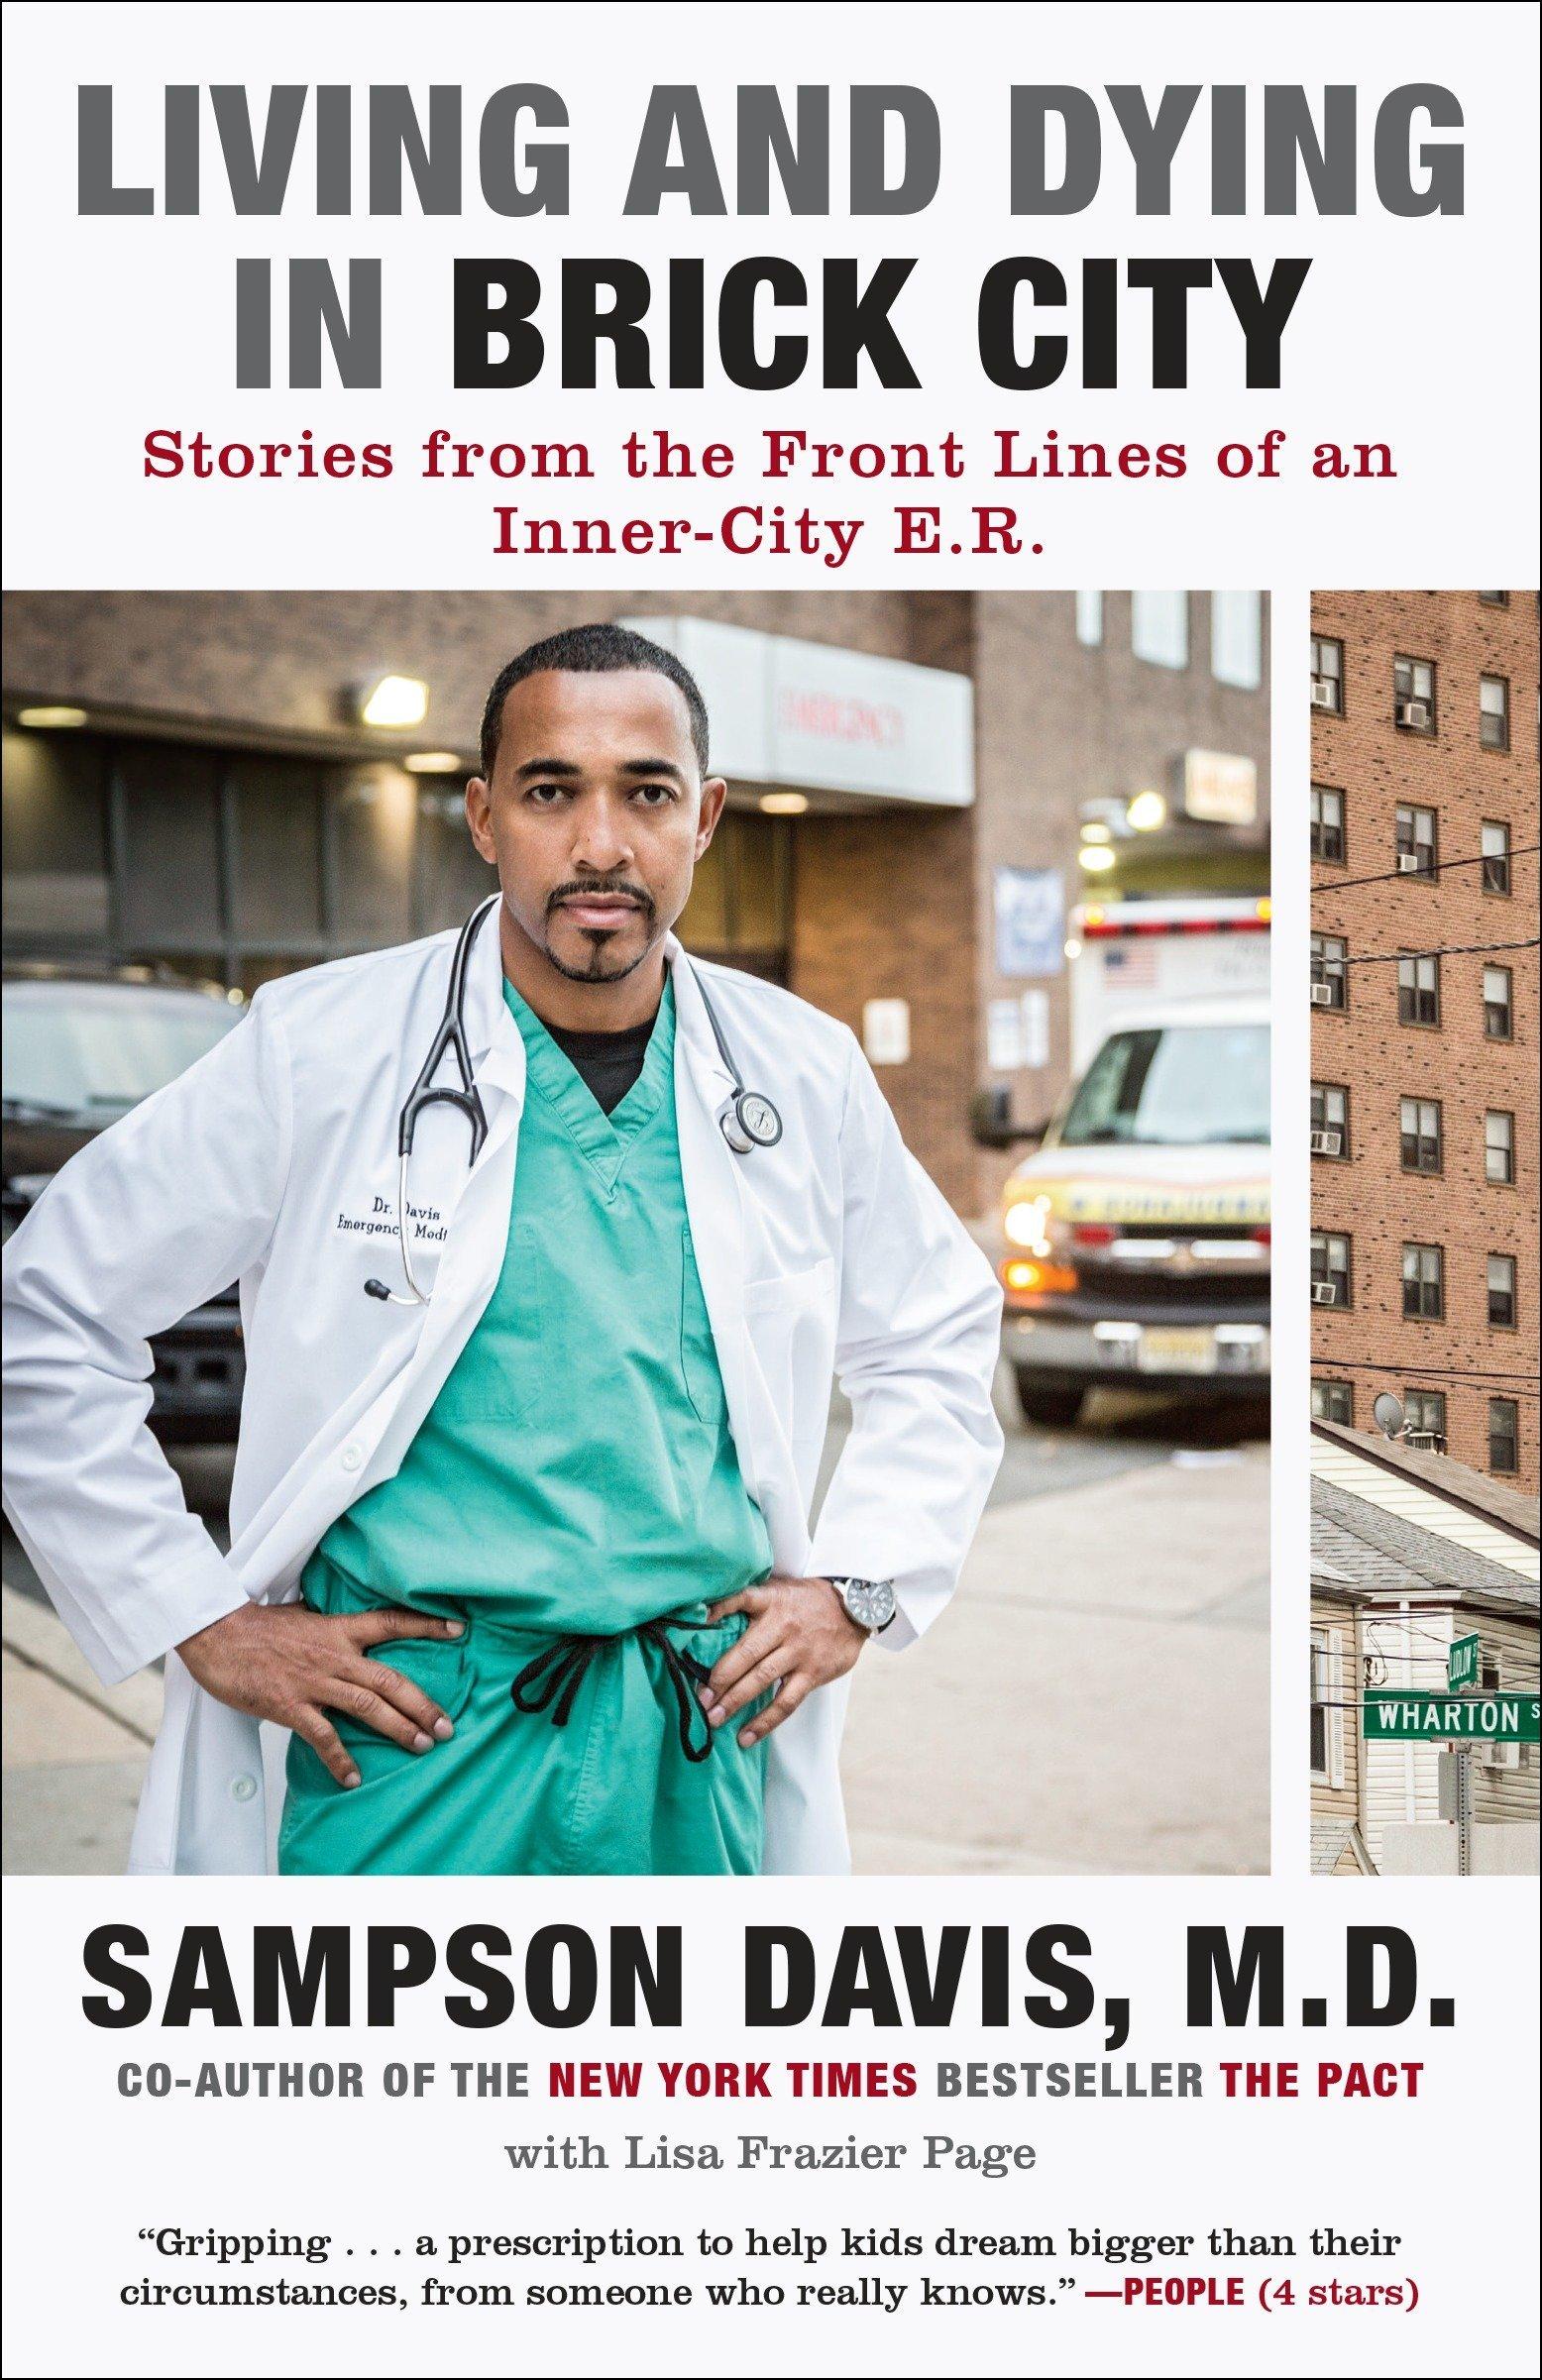 dr sampson davis biography